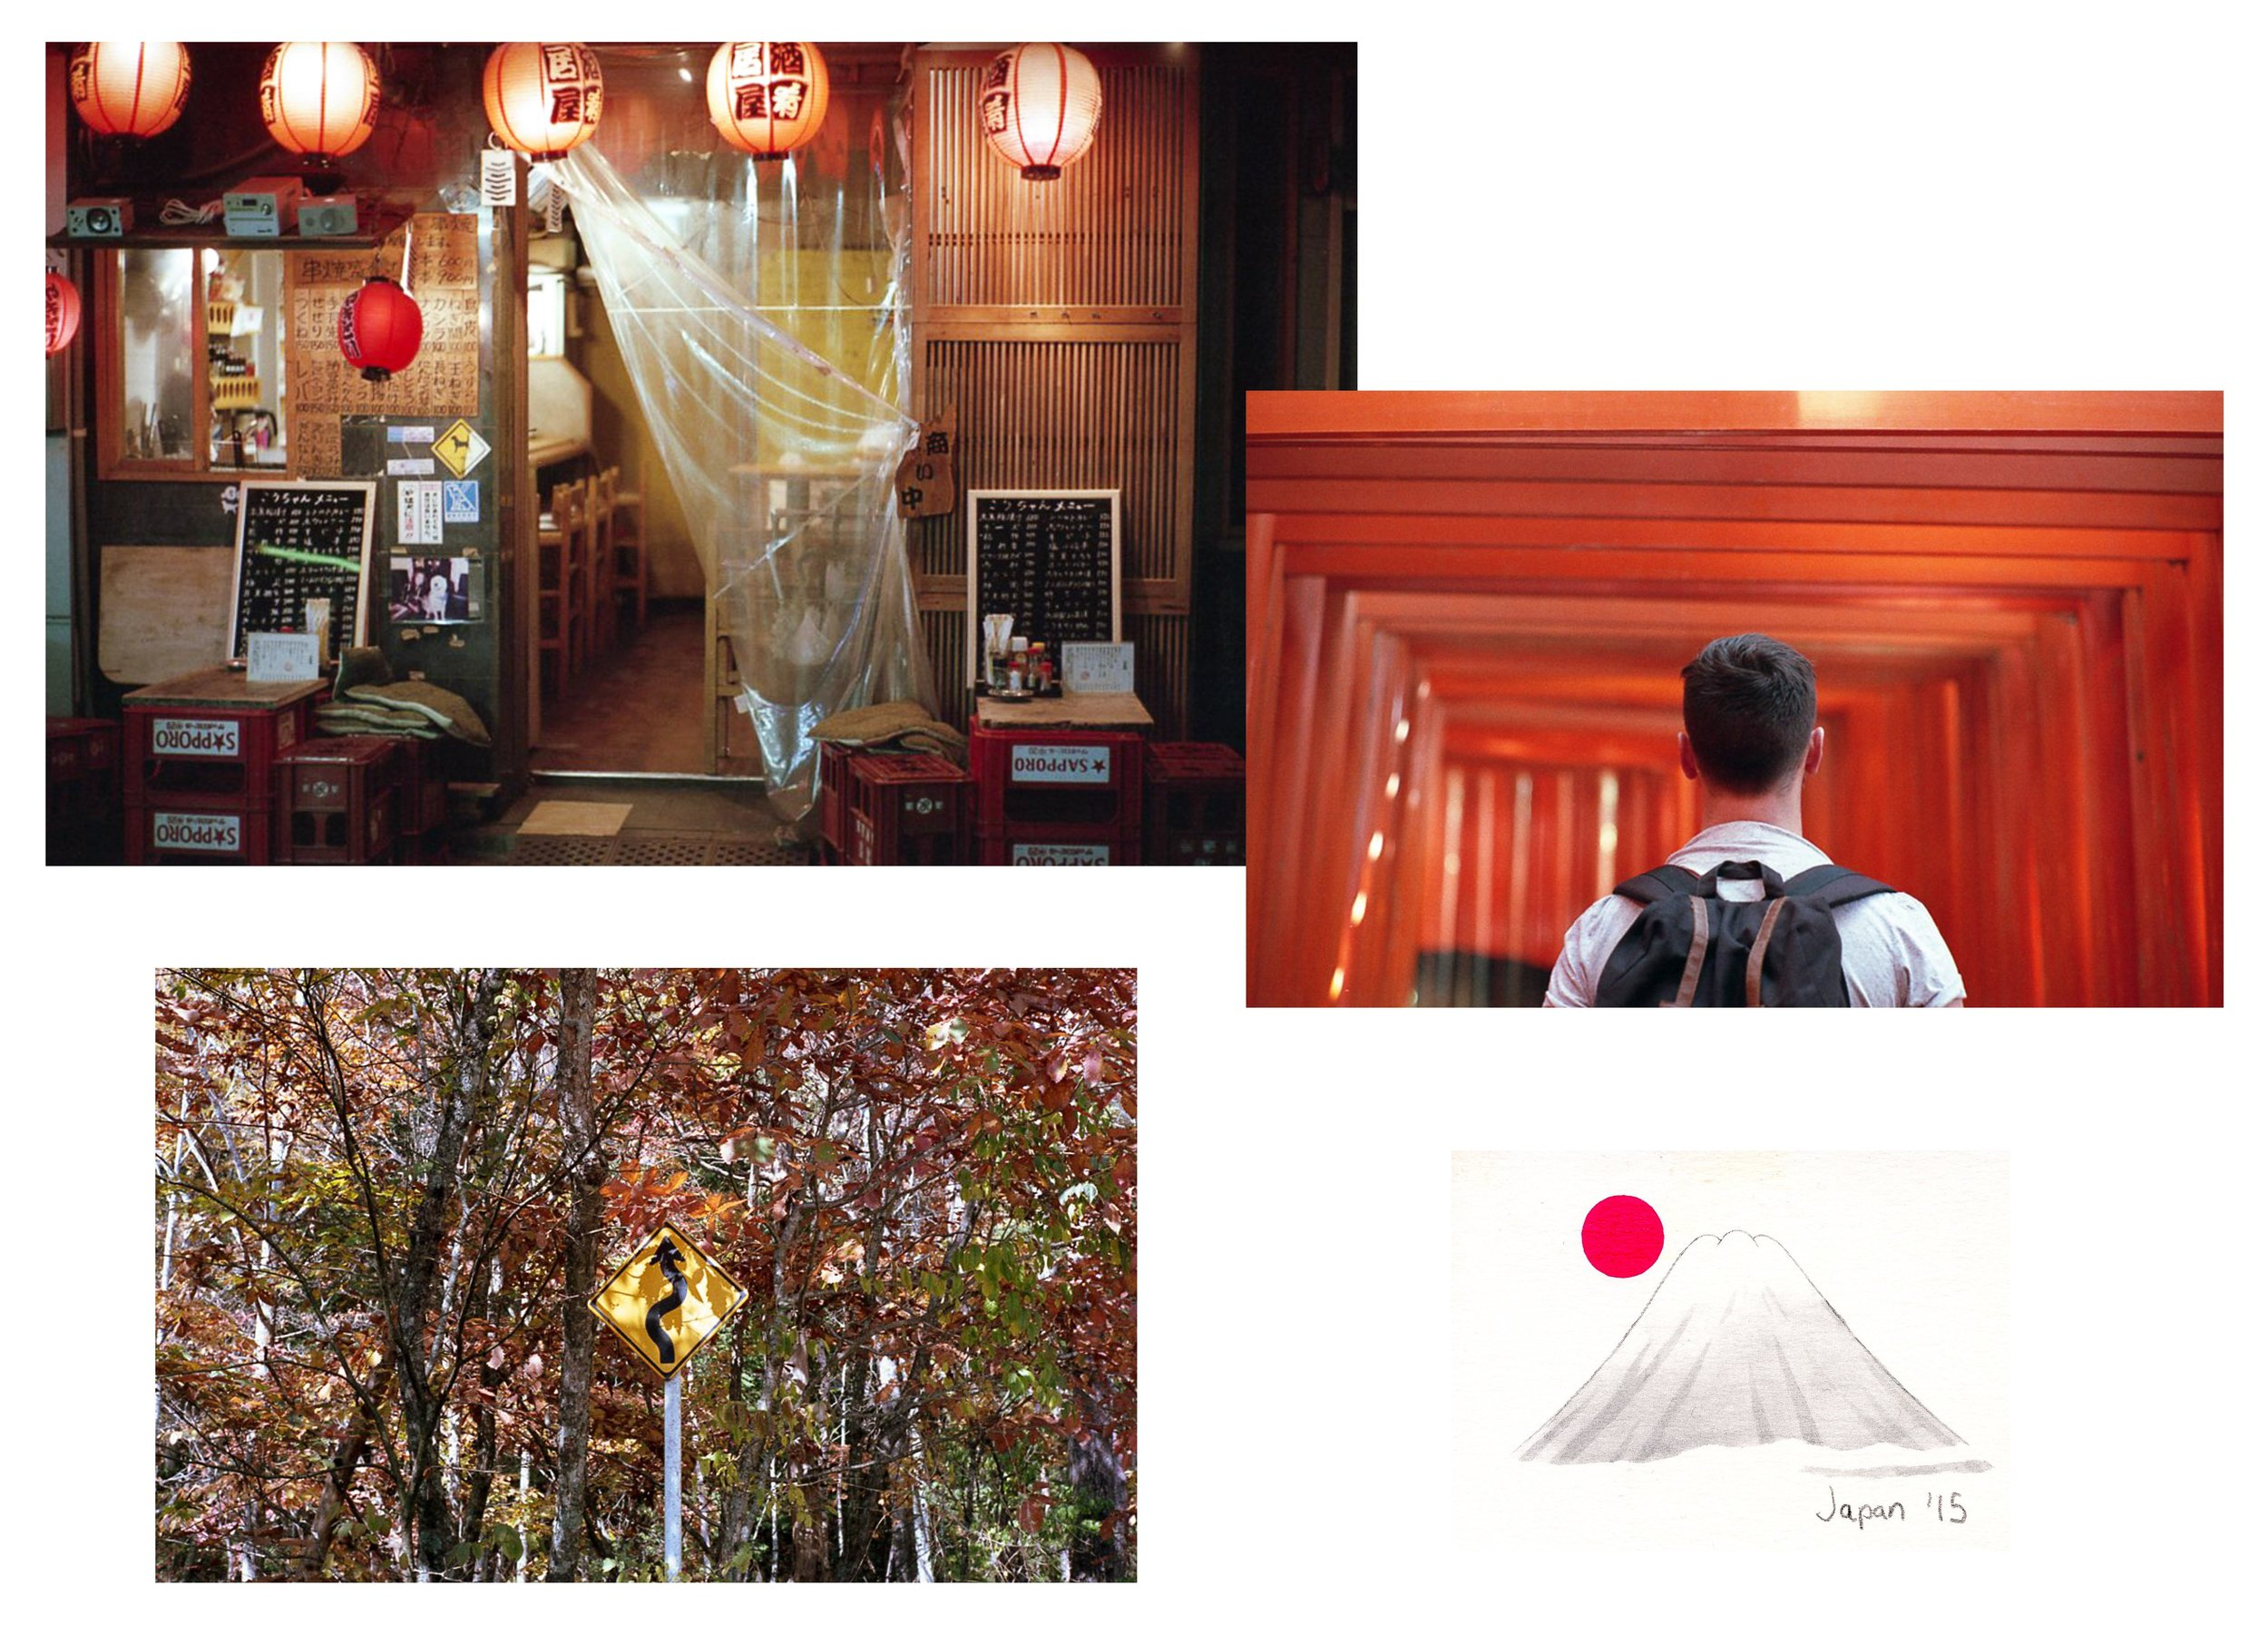 Japan collage 1e.jpg